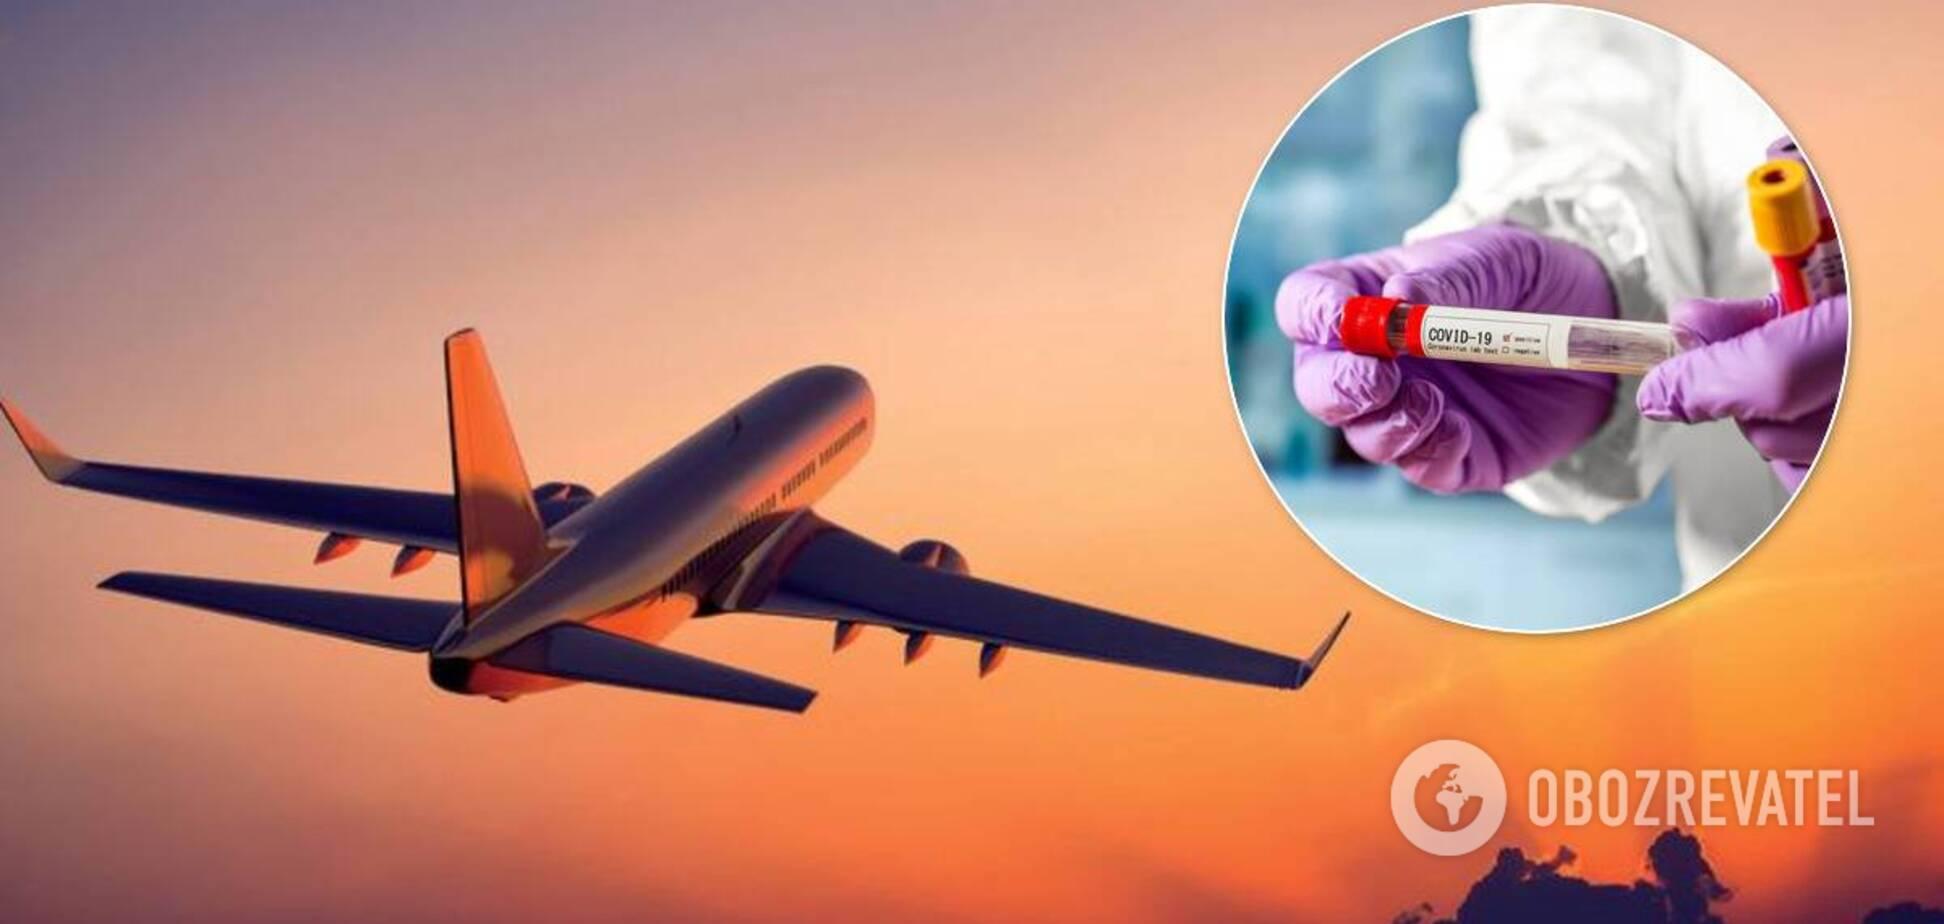 Коронавирус в самолете